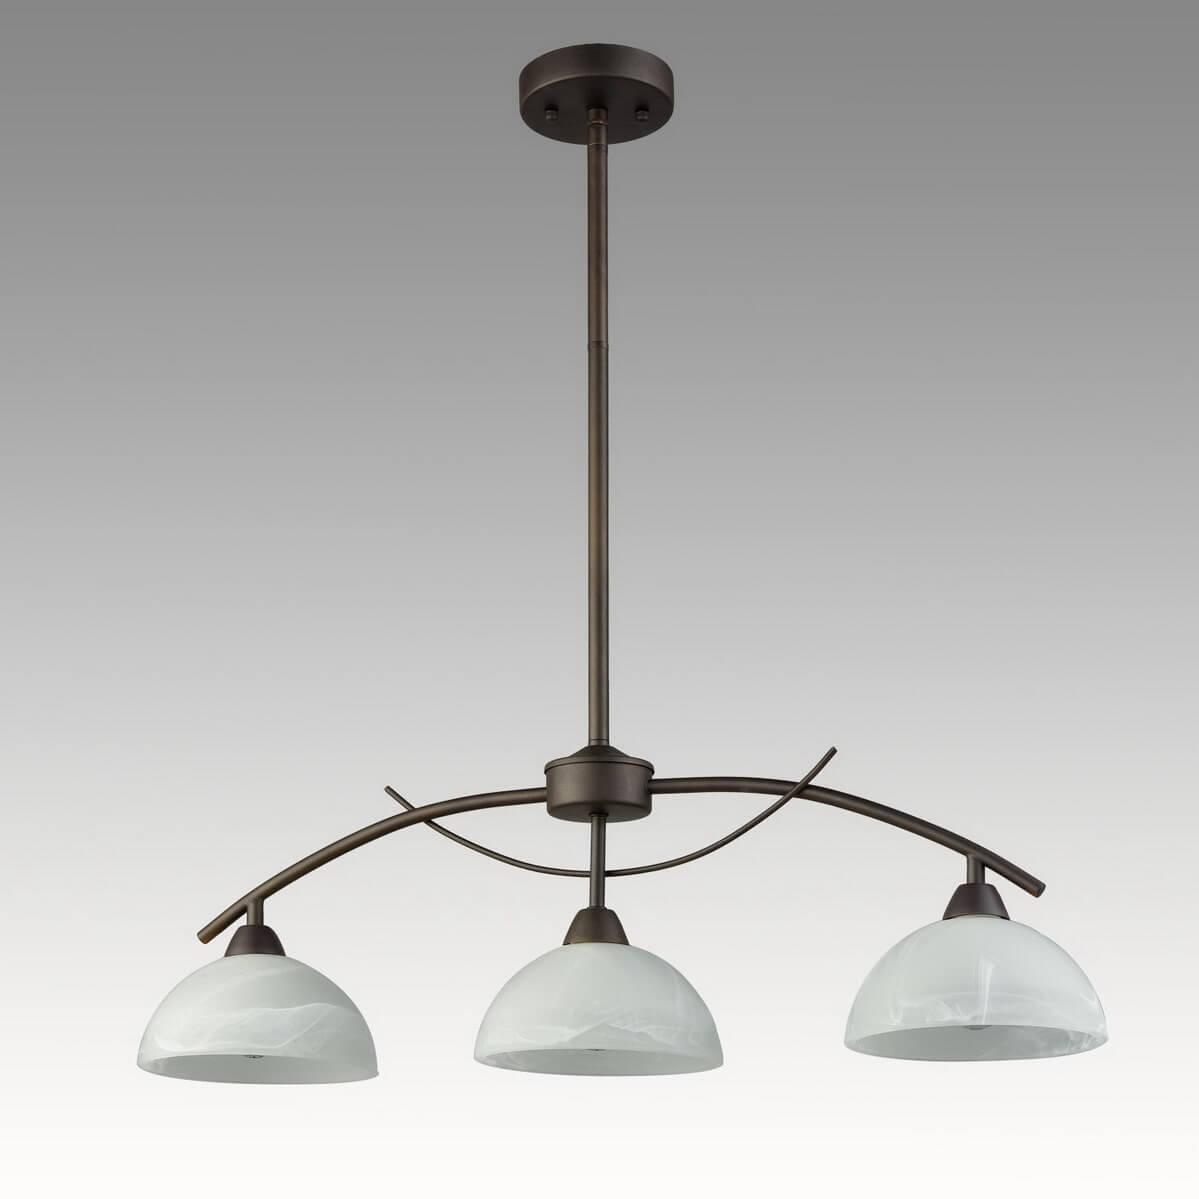 Vintage 3-Light Kitchen Pendant Lighting, Golden Bronze